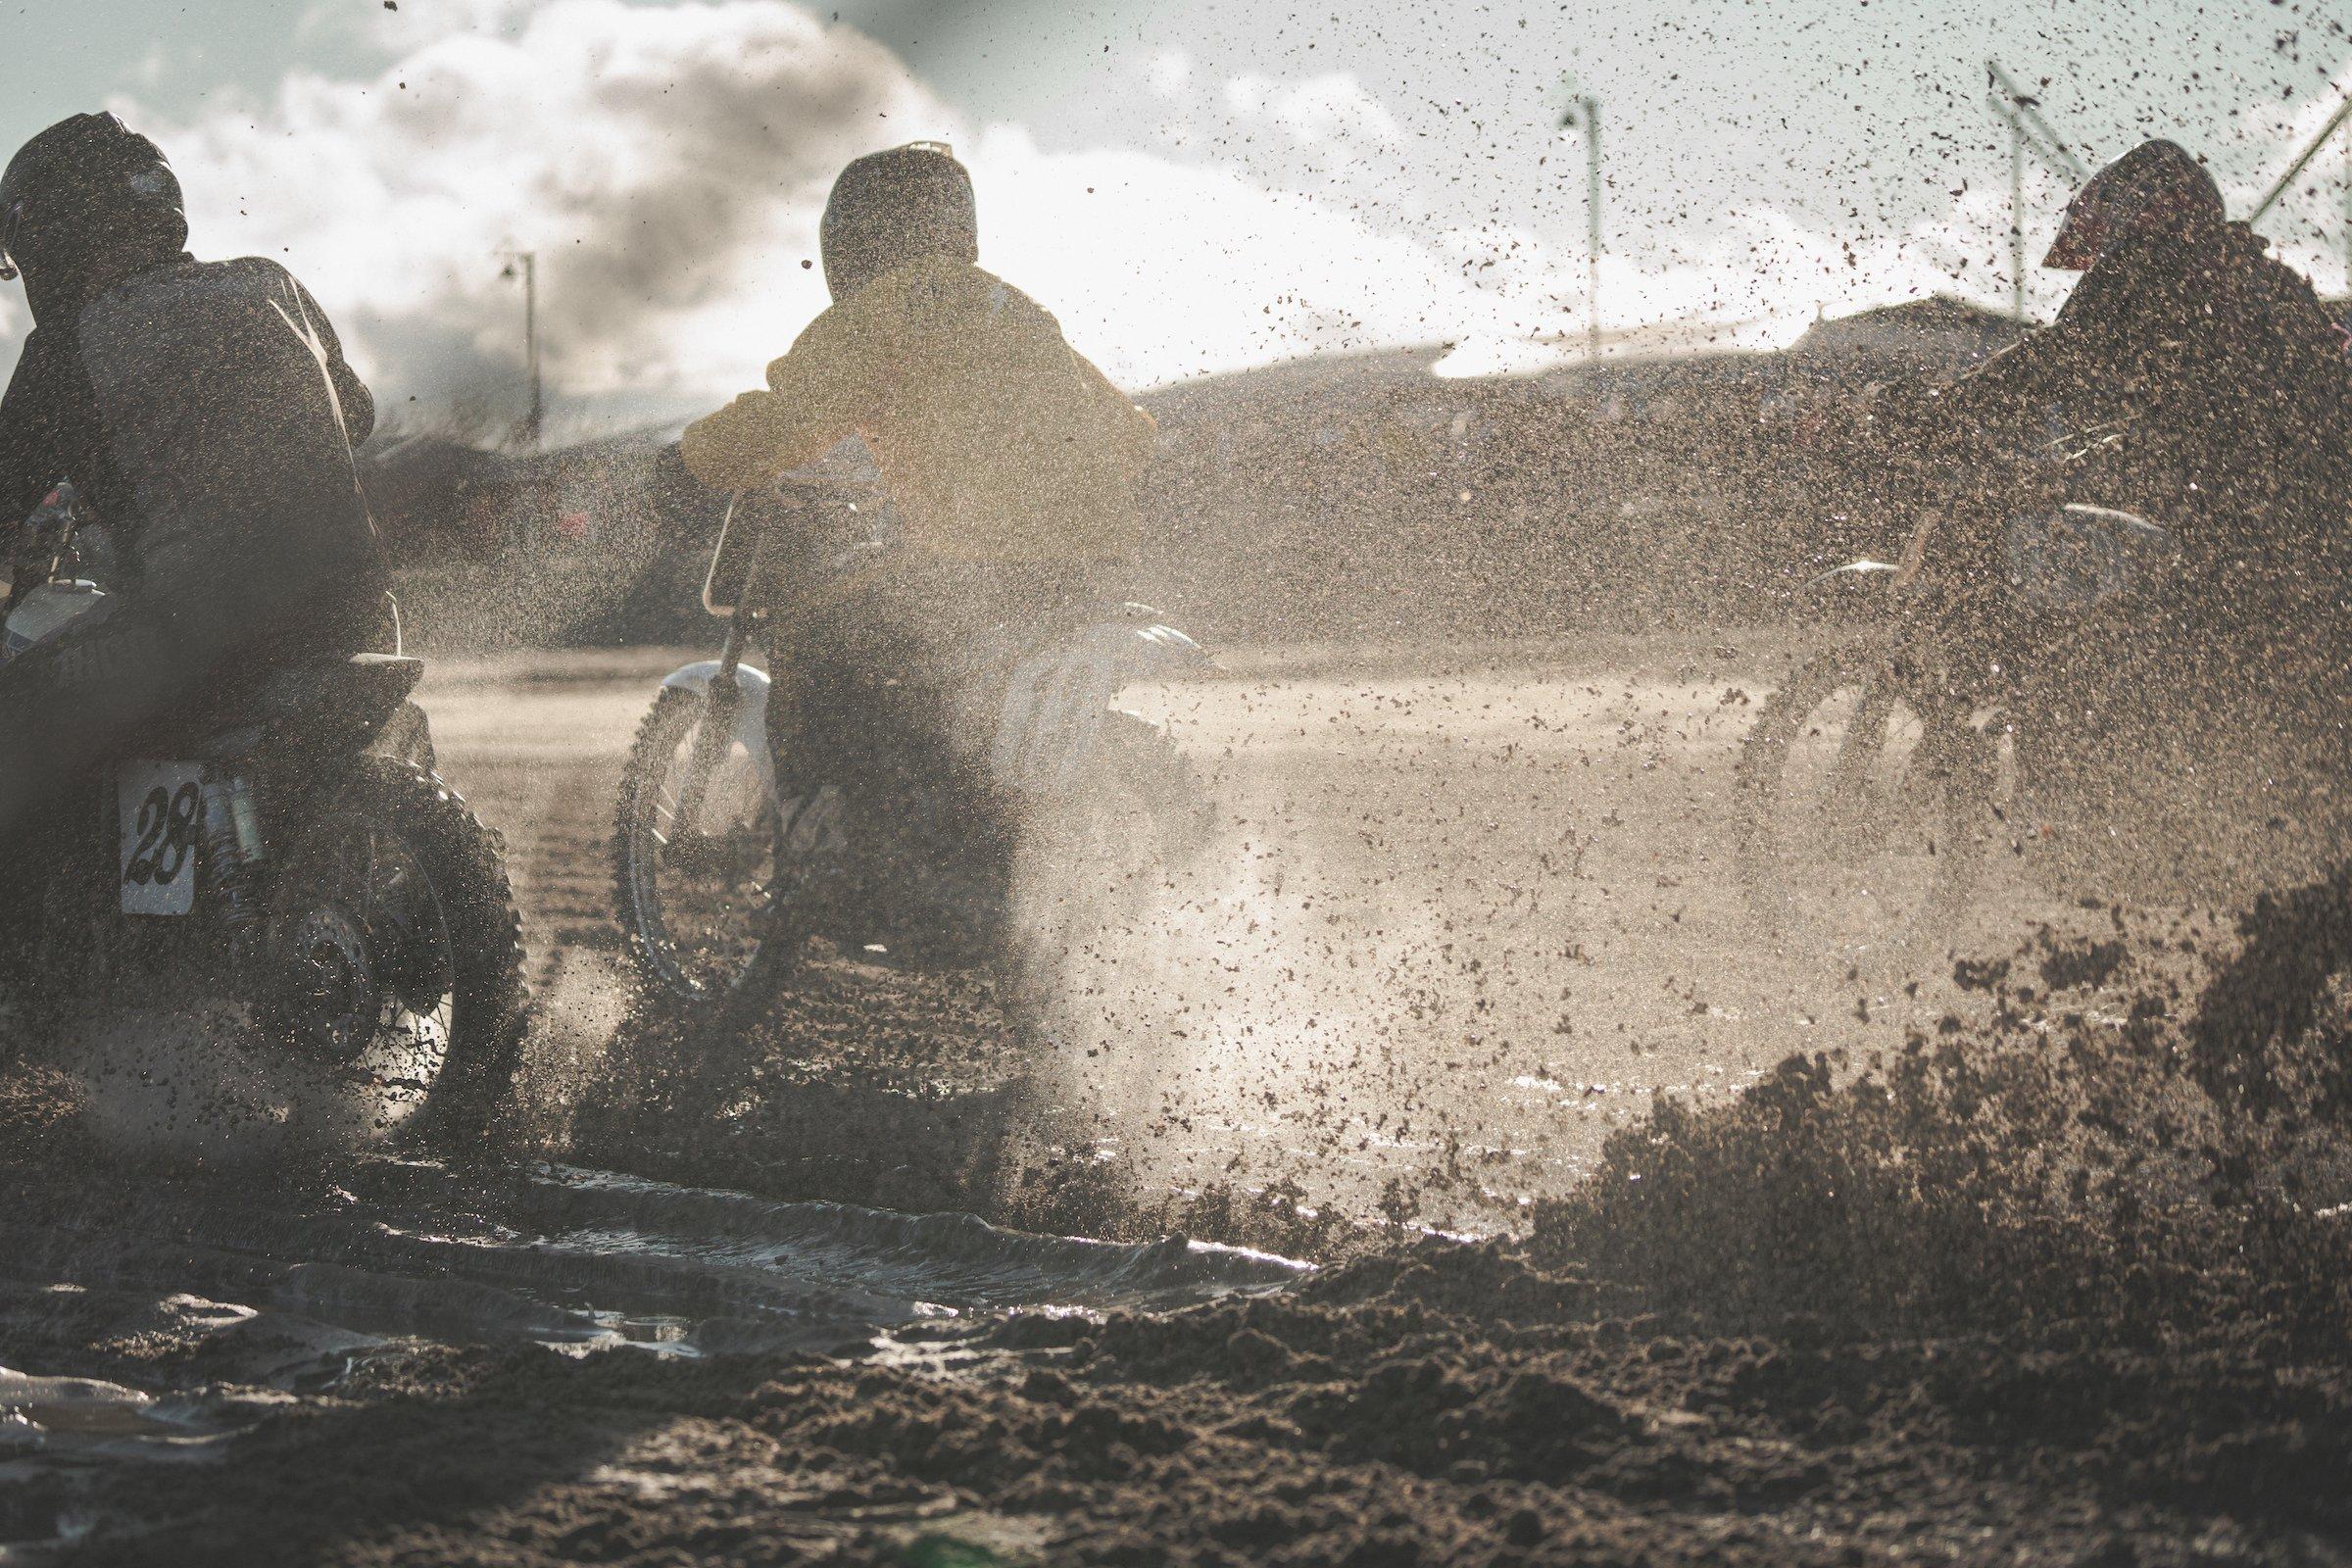 Mablethorpe Motorcycle Sand Racing 18